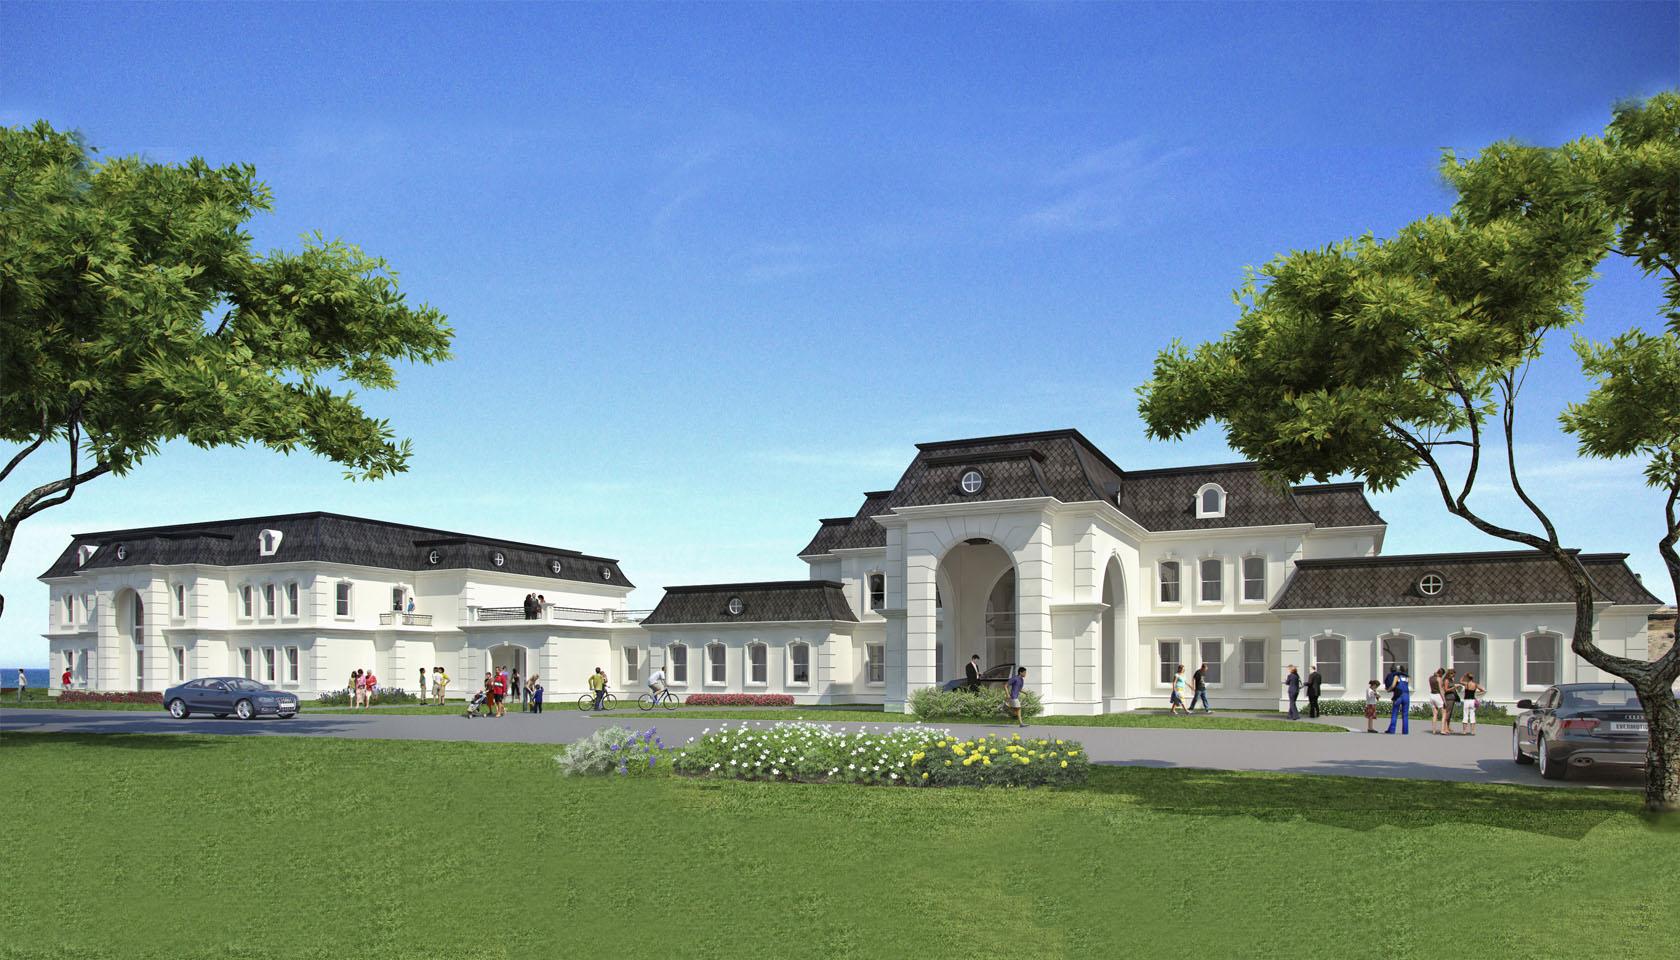 Arquitectura neoclásica francesa. Diseño de club house neoclásico francés, arquitectura con mansardas.